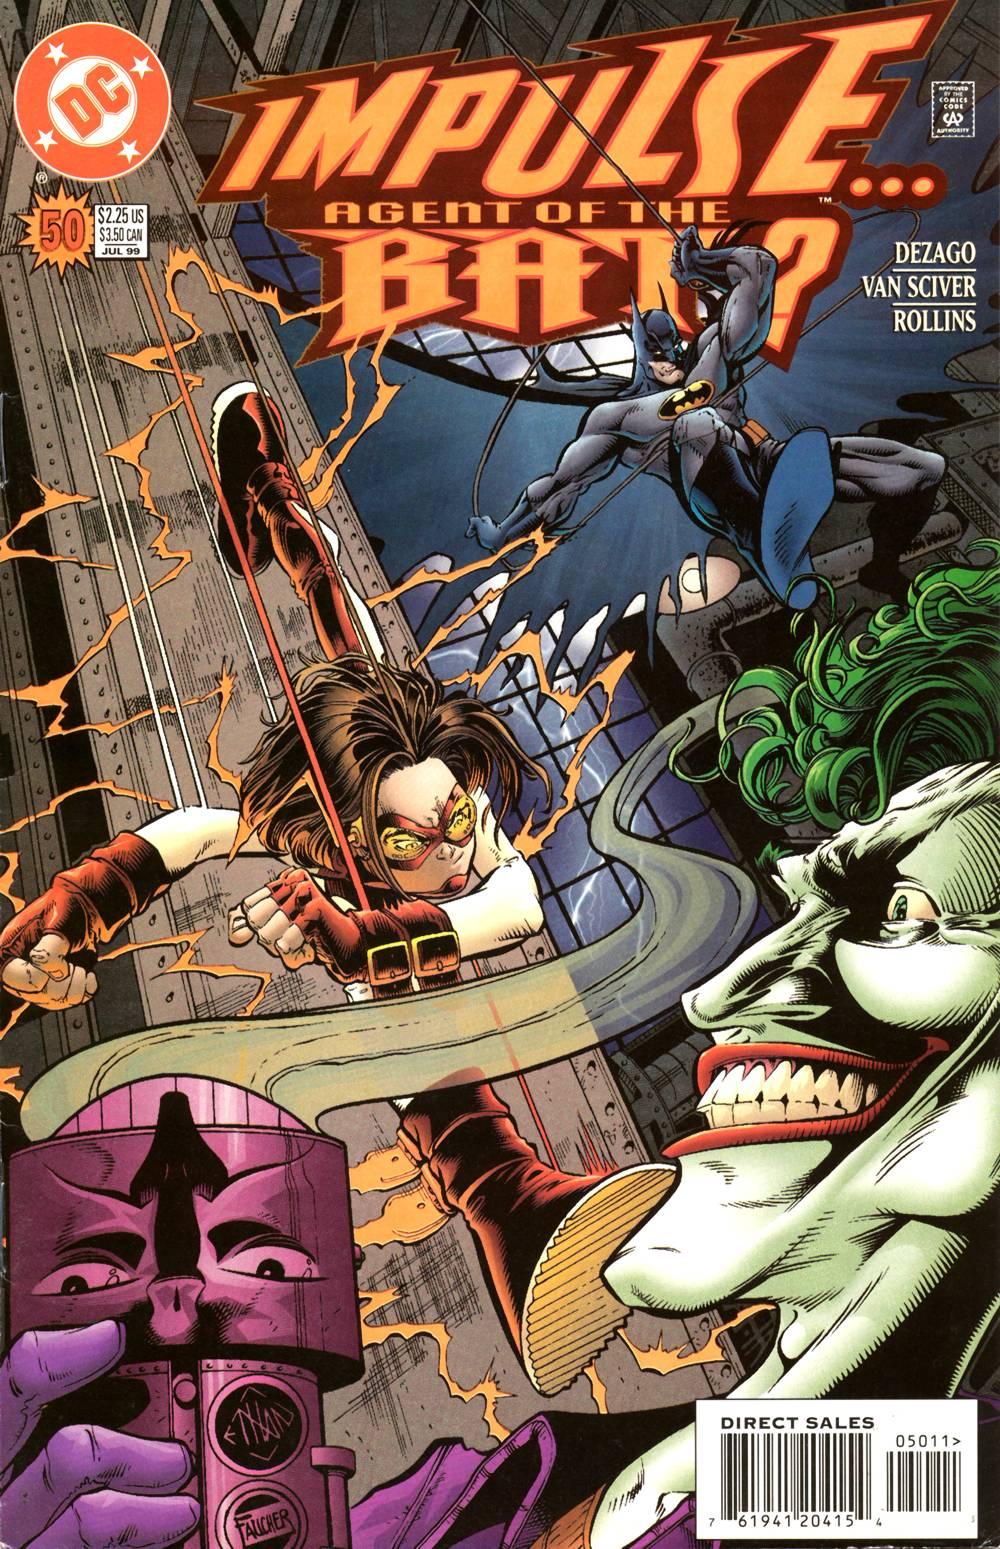 Impulse Vol 1 84 - DC Comics Database